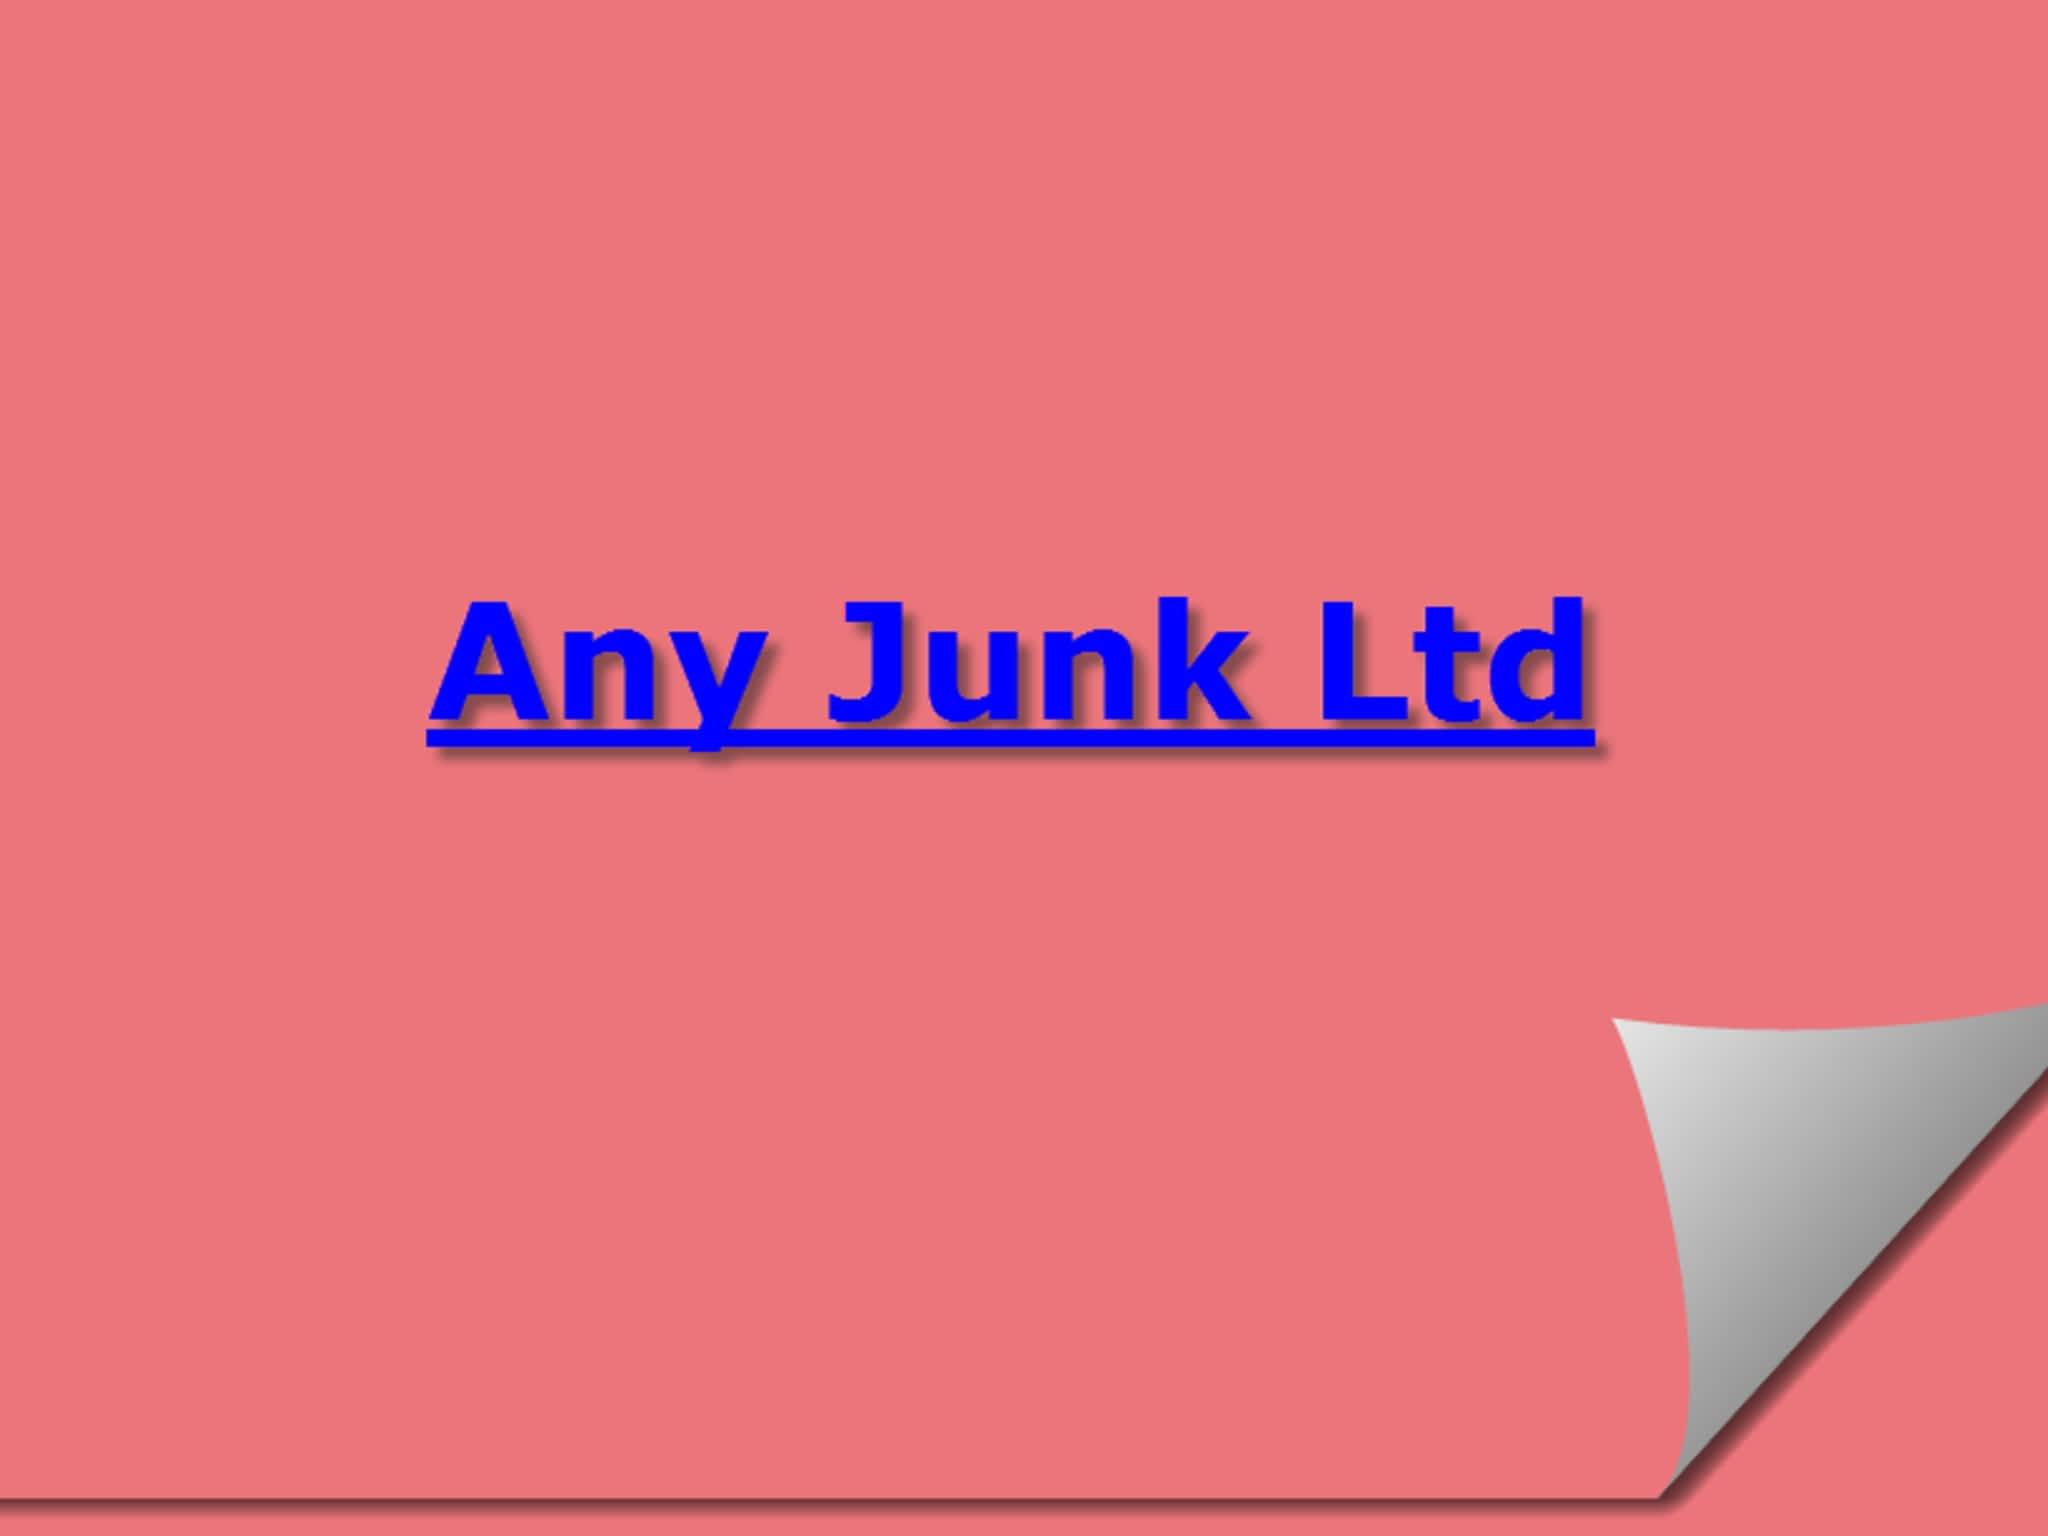 photo Any Junk Ltd